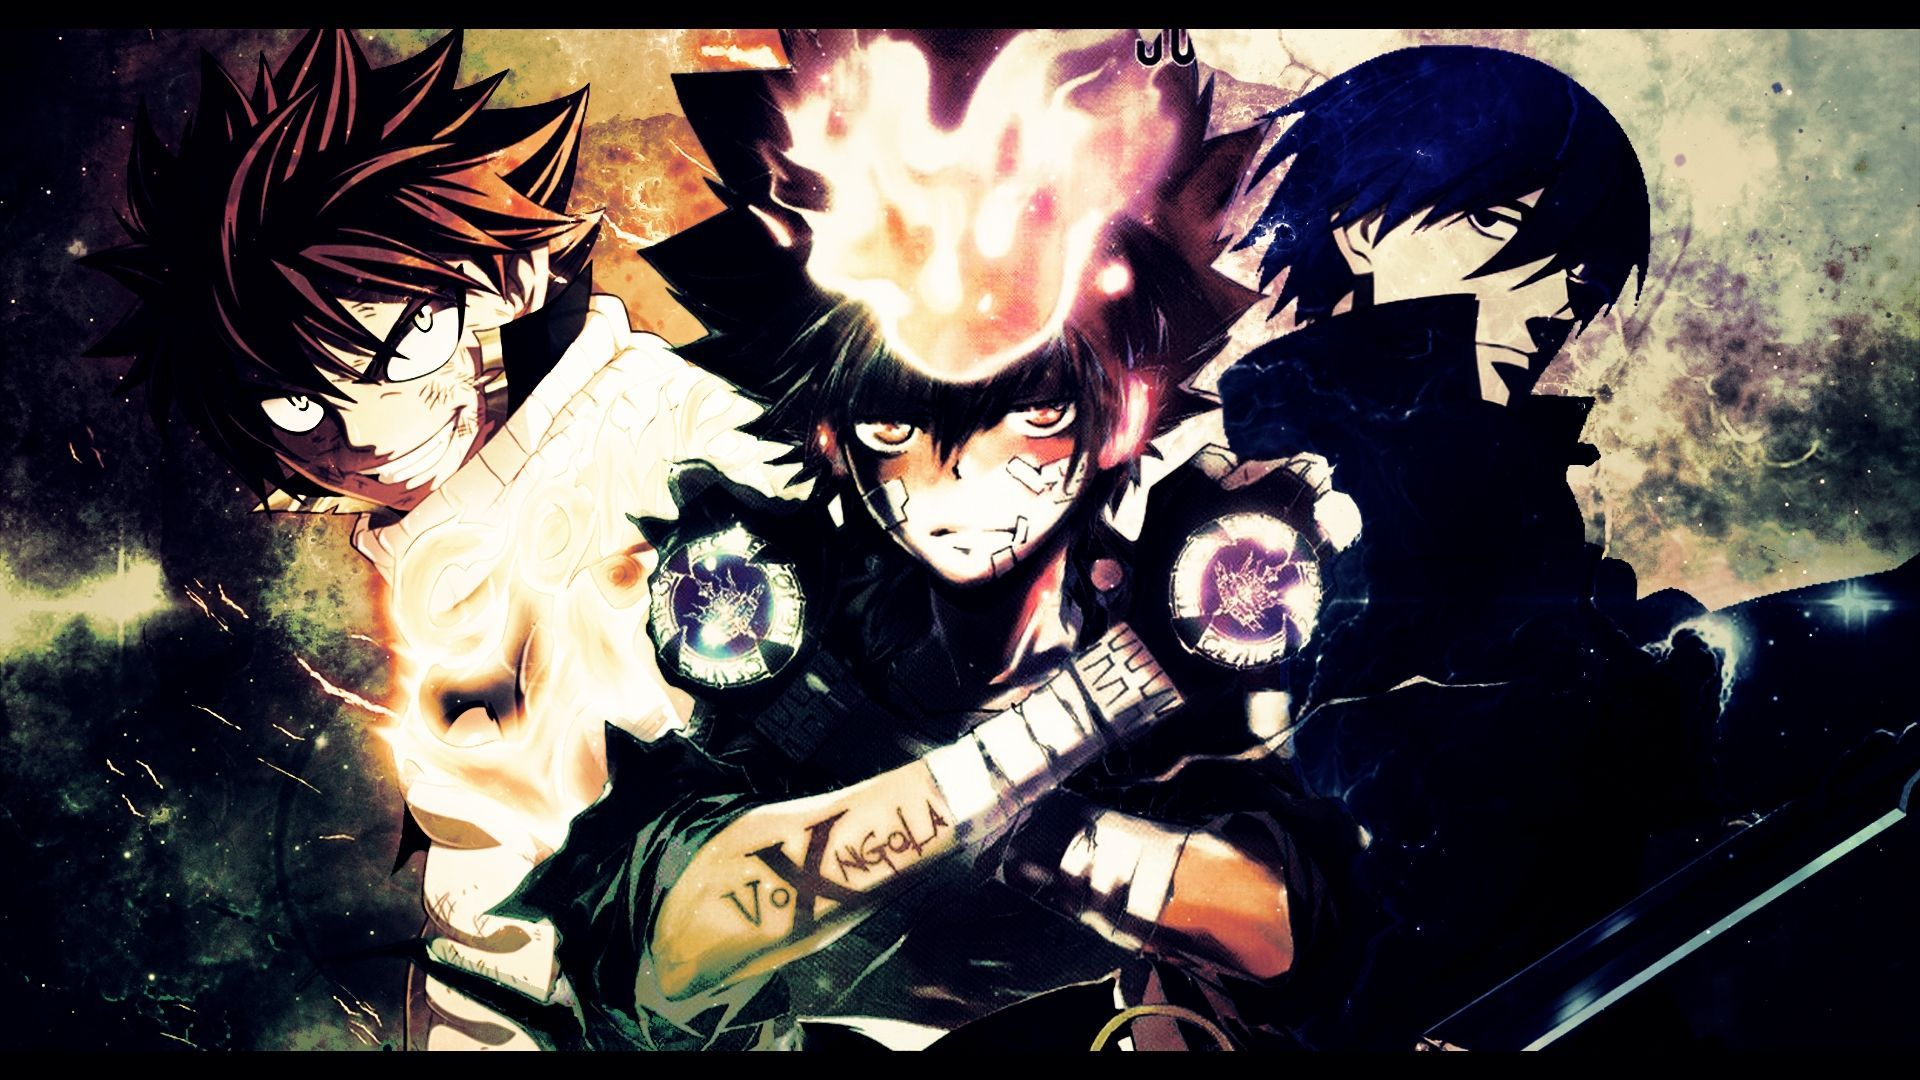 Wallpapers Anime Group 74